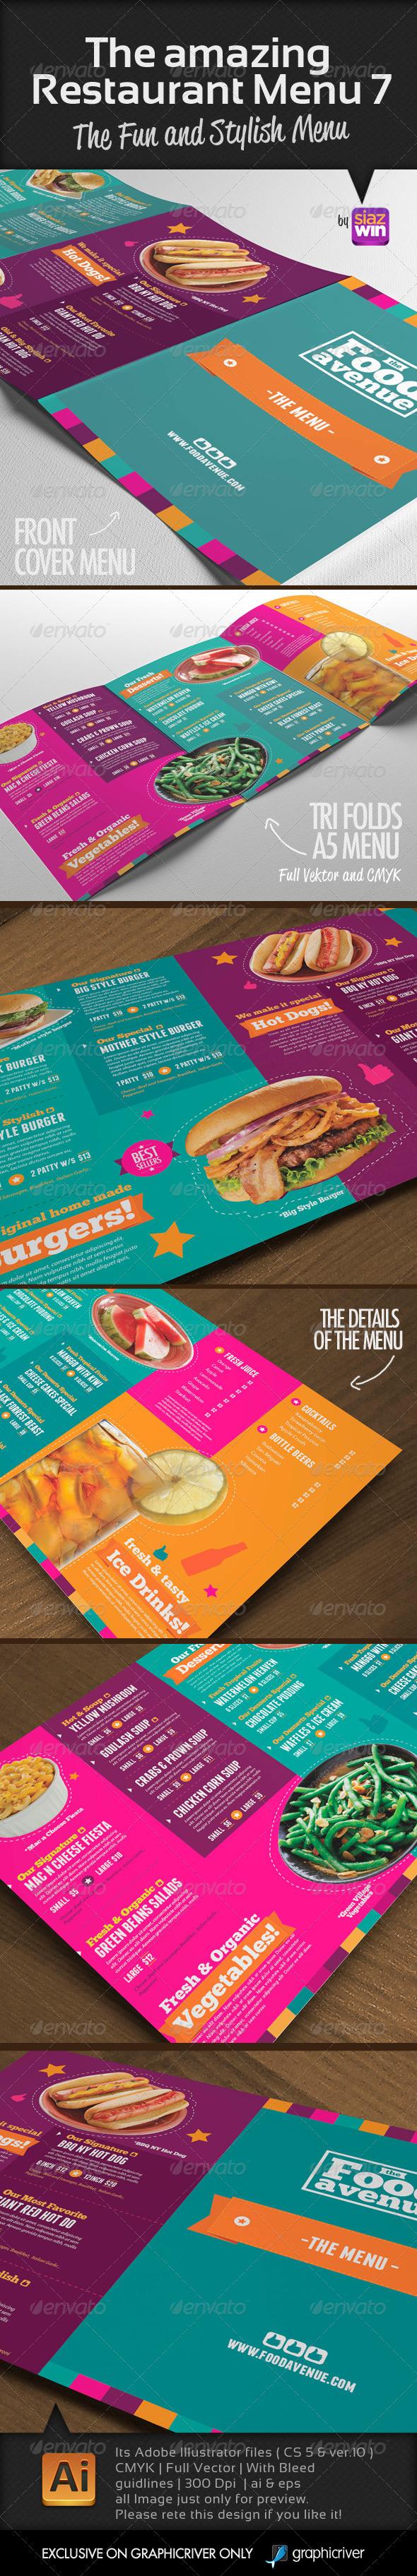 GraphicRiver The Amazing Restaurant Menu 7 5421775